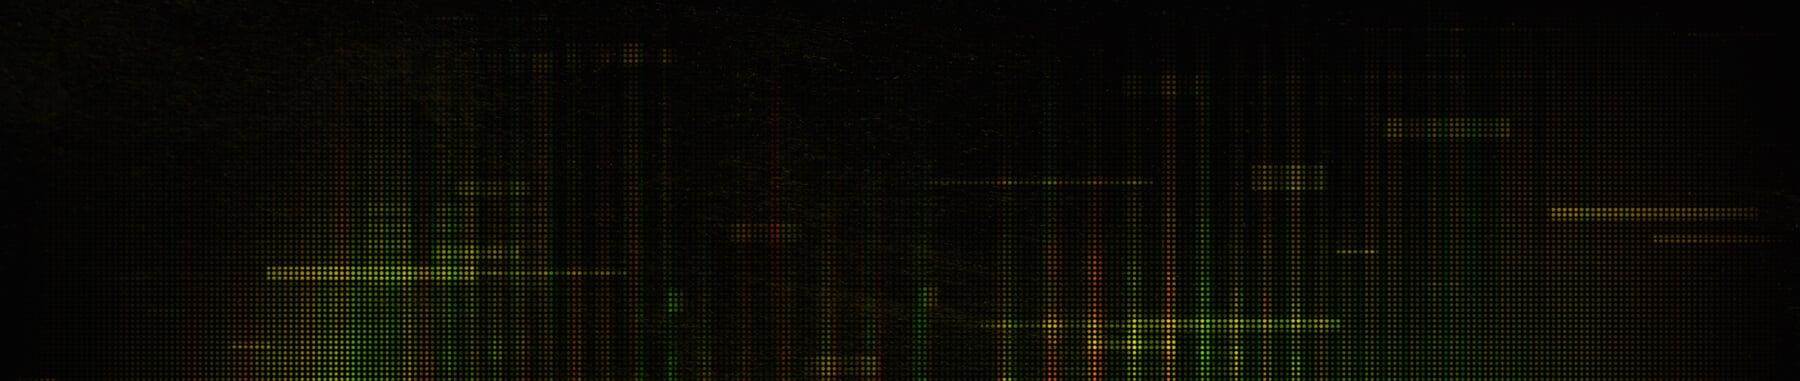 Data Analysis Upper Background